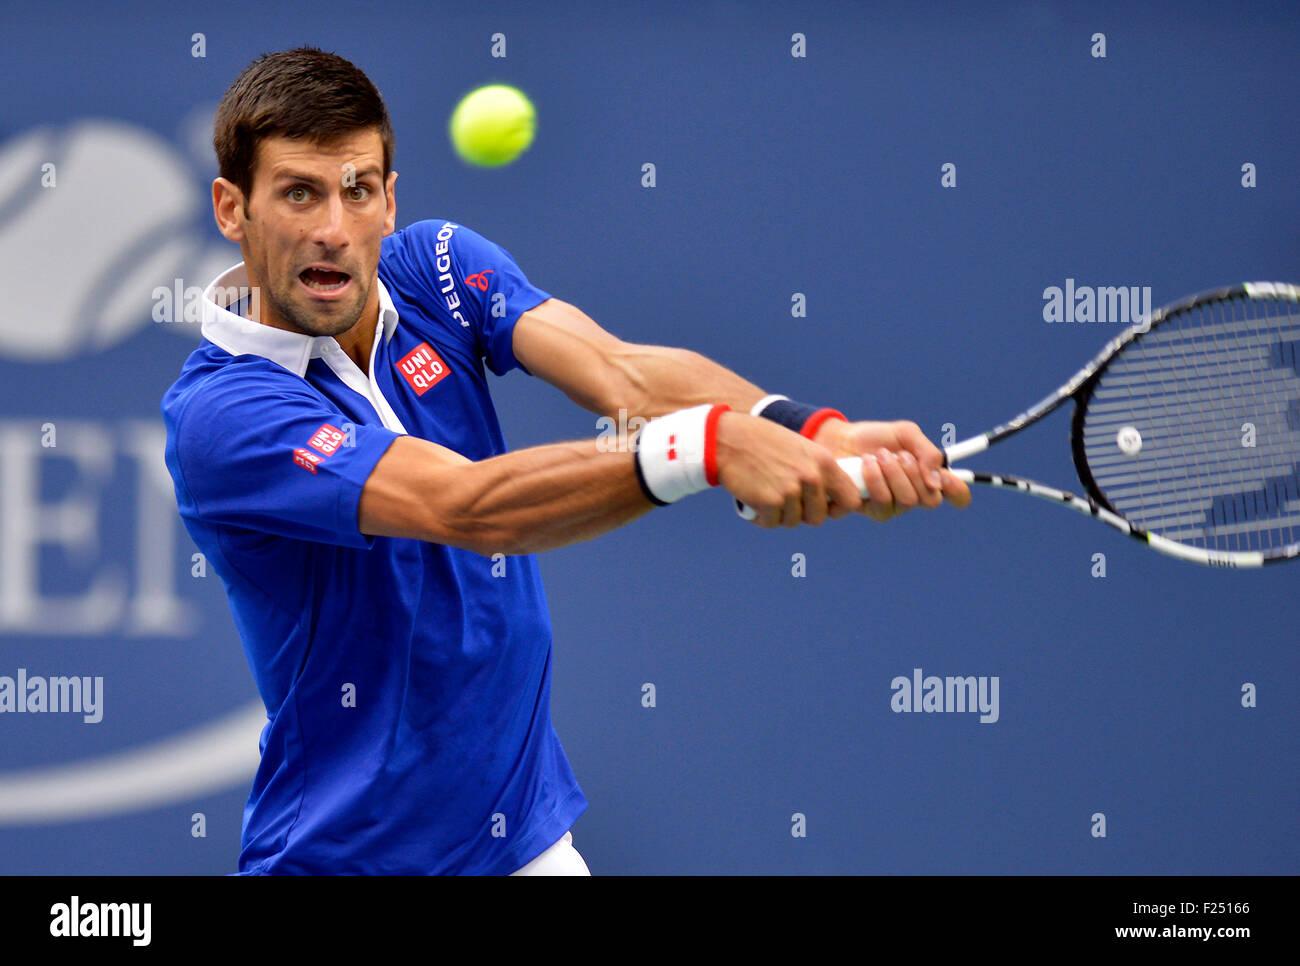 New York, USA. 11th Sep, 2015. Novak Djokovic of Serbia returns a shot to Marin Cilic of Croatia during their men's - Stock Image